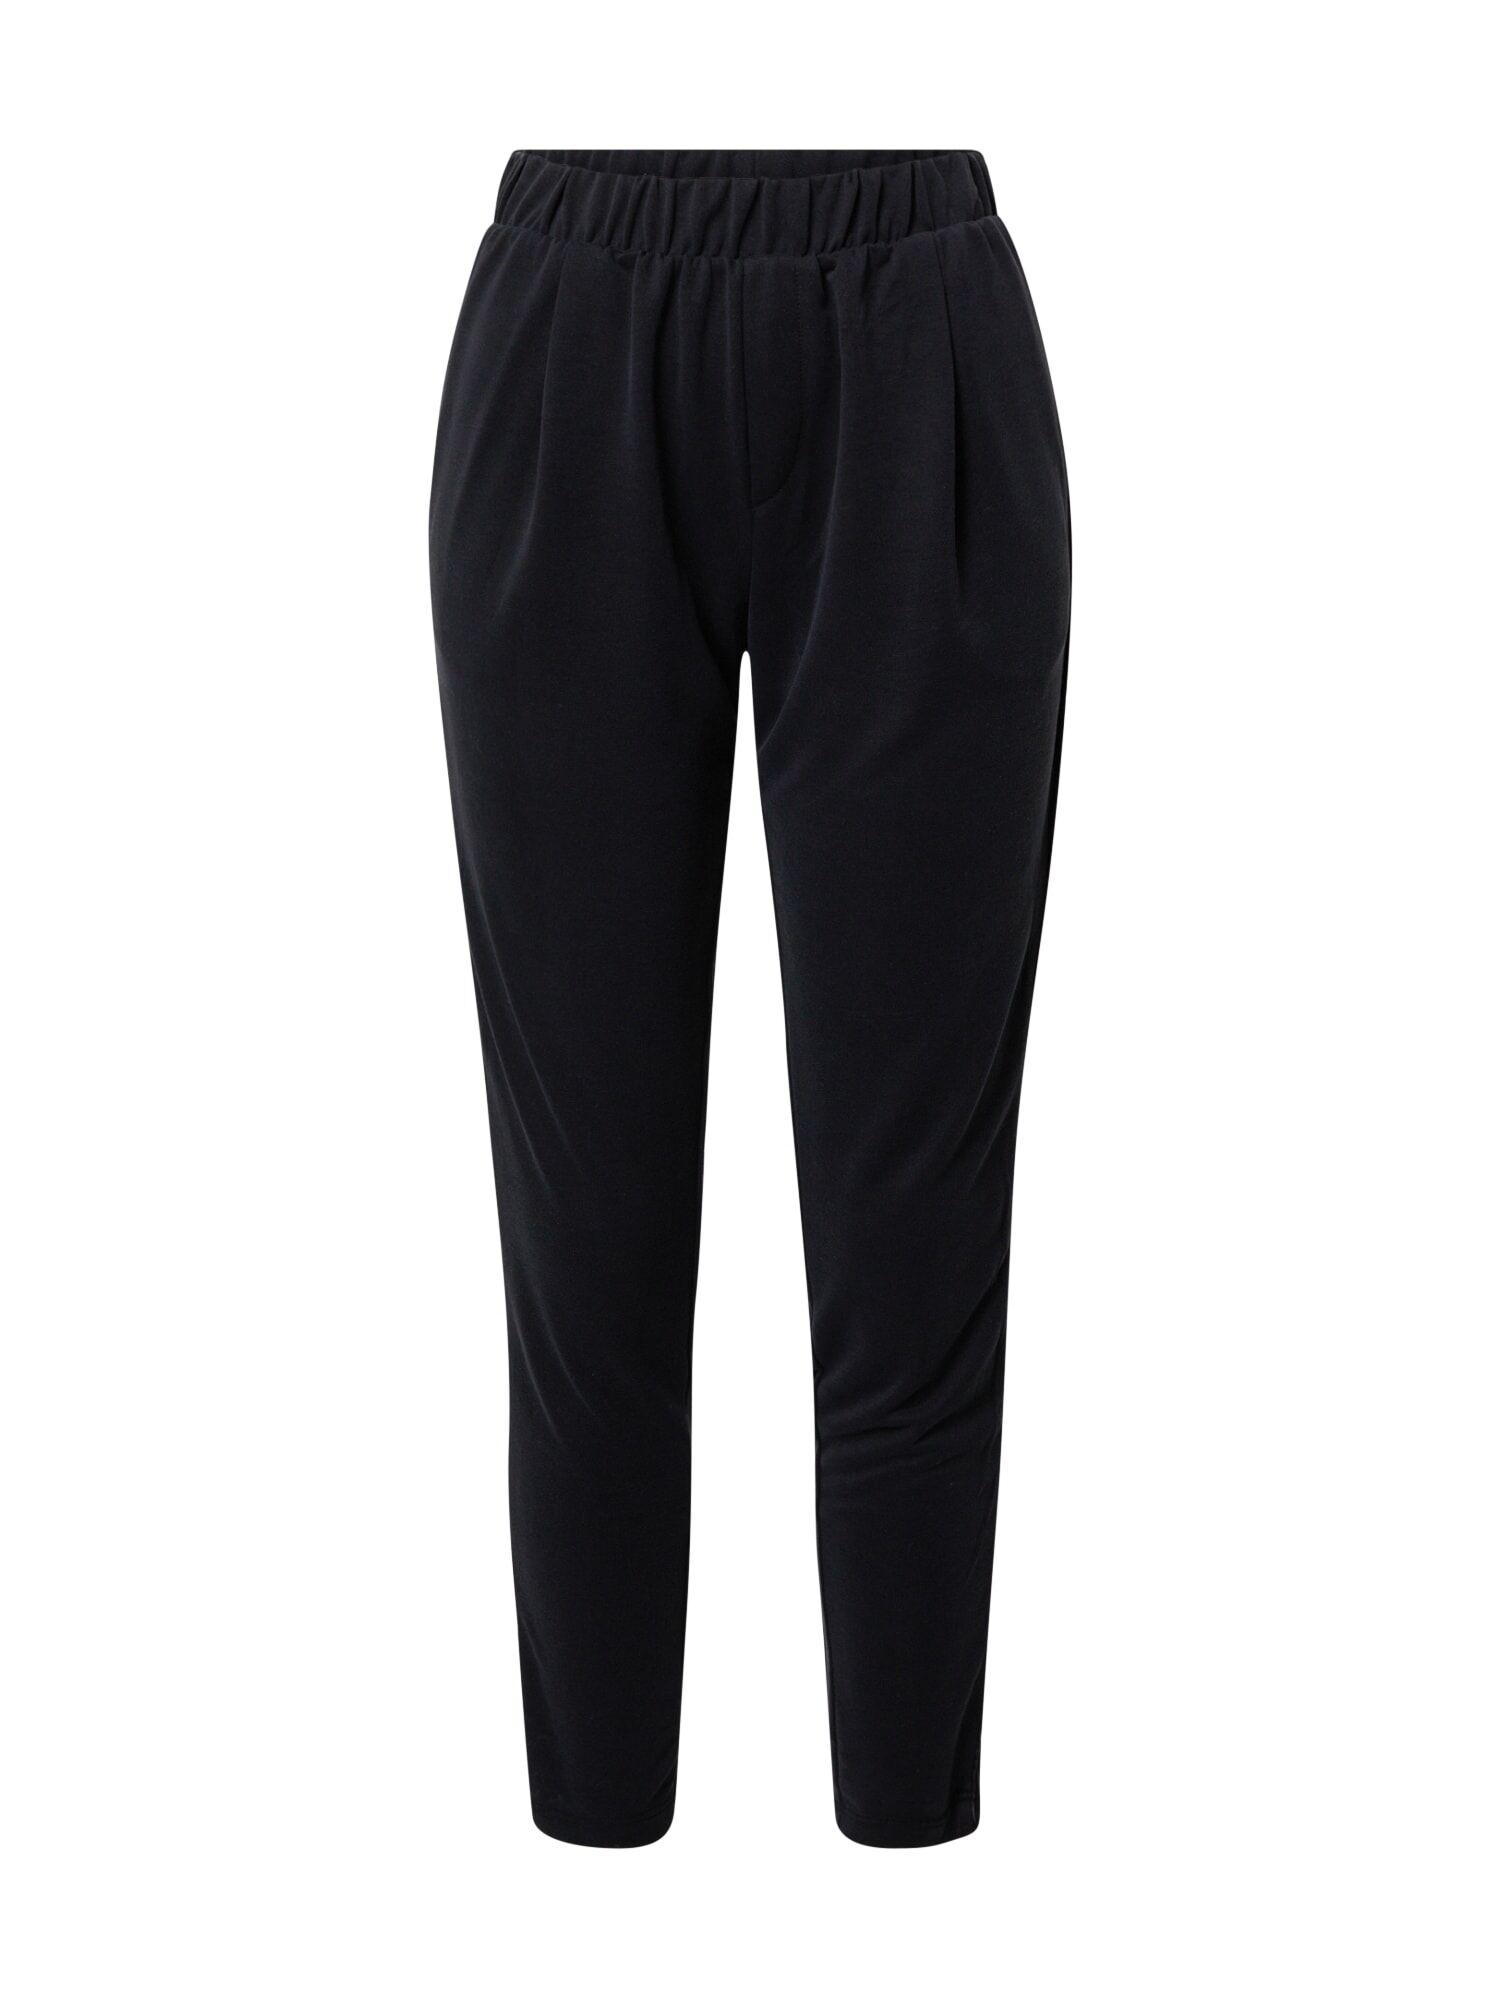 Love & Divine Pantalon 'Love333'  - Noir - Taille: XL - female